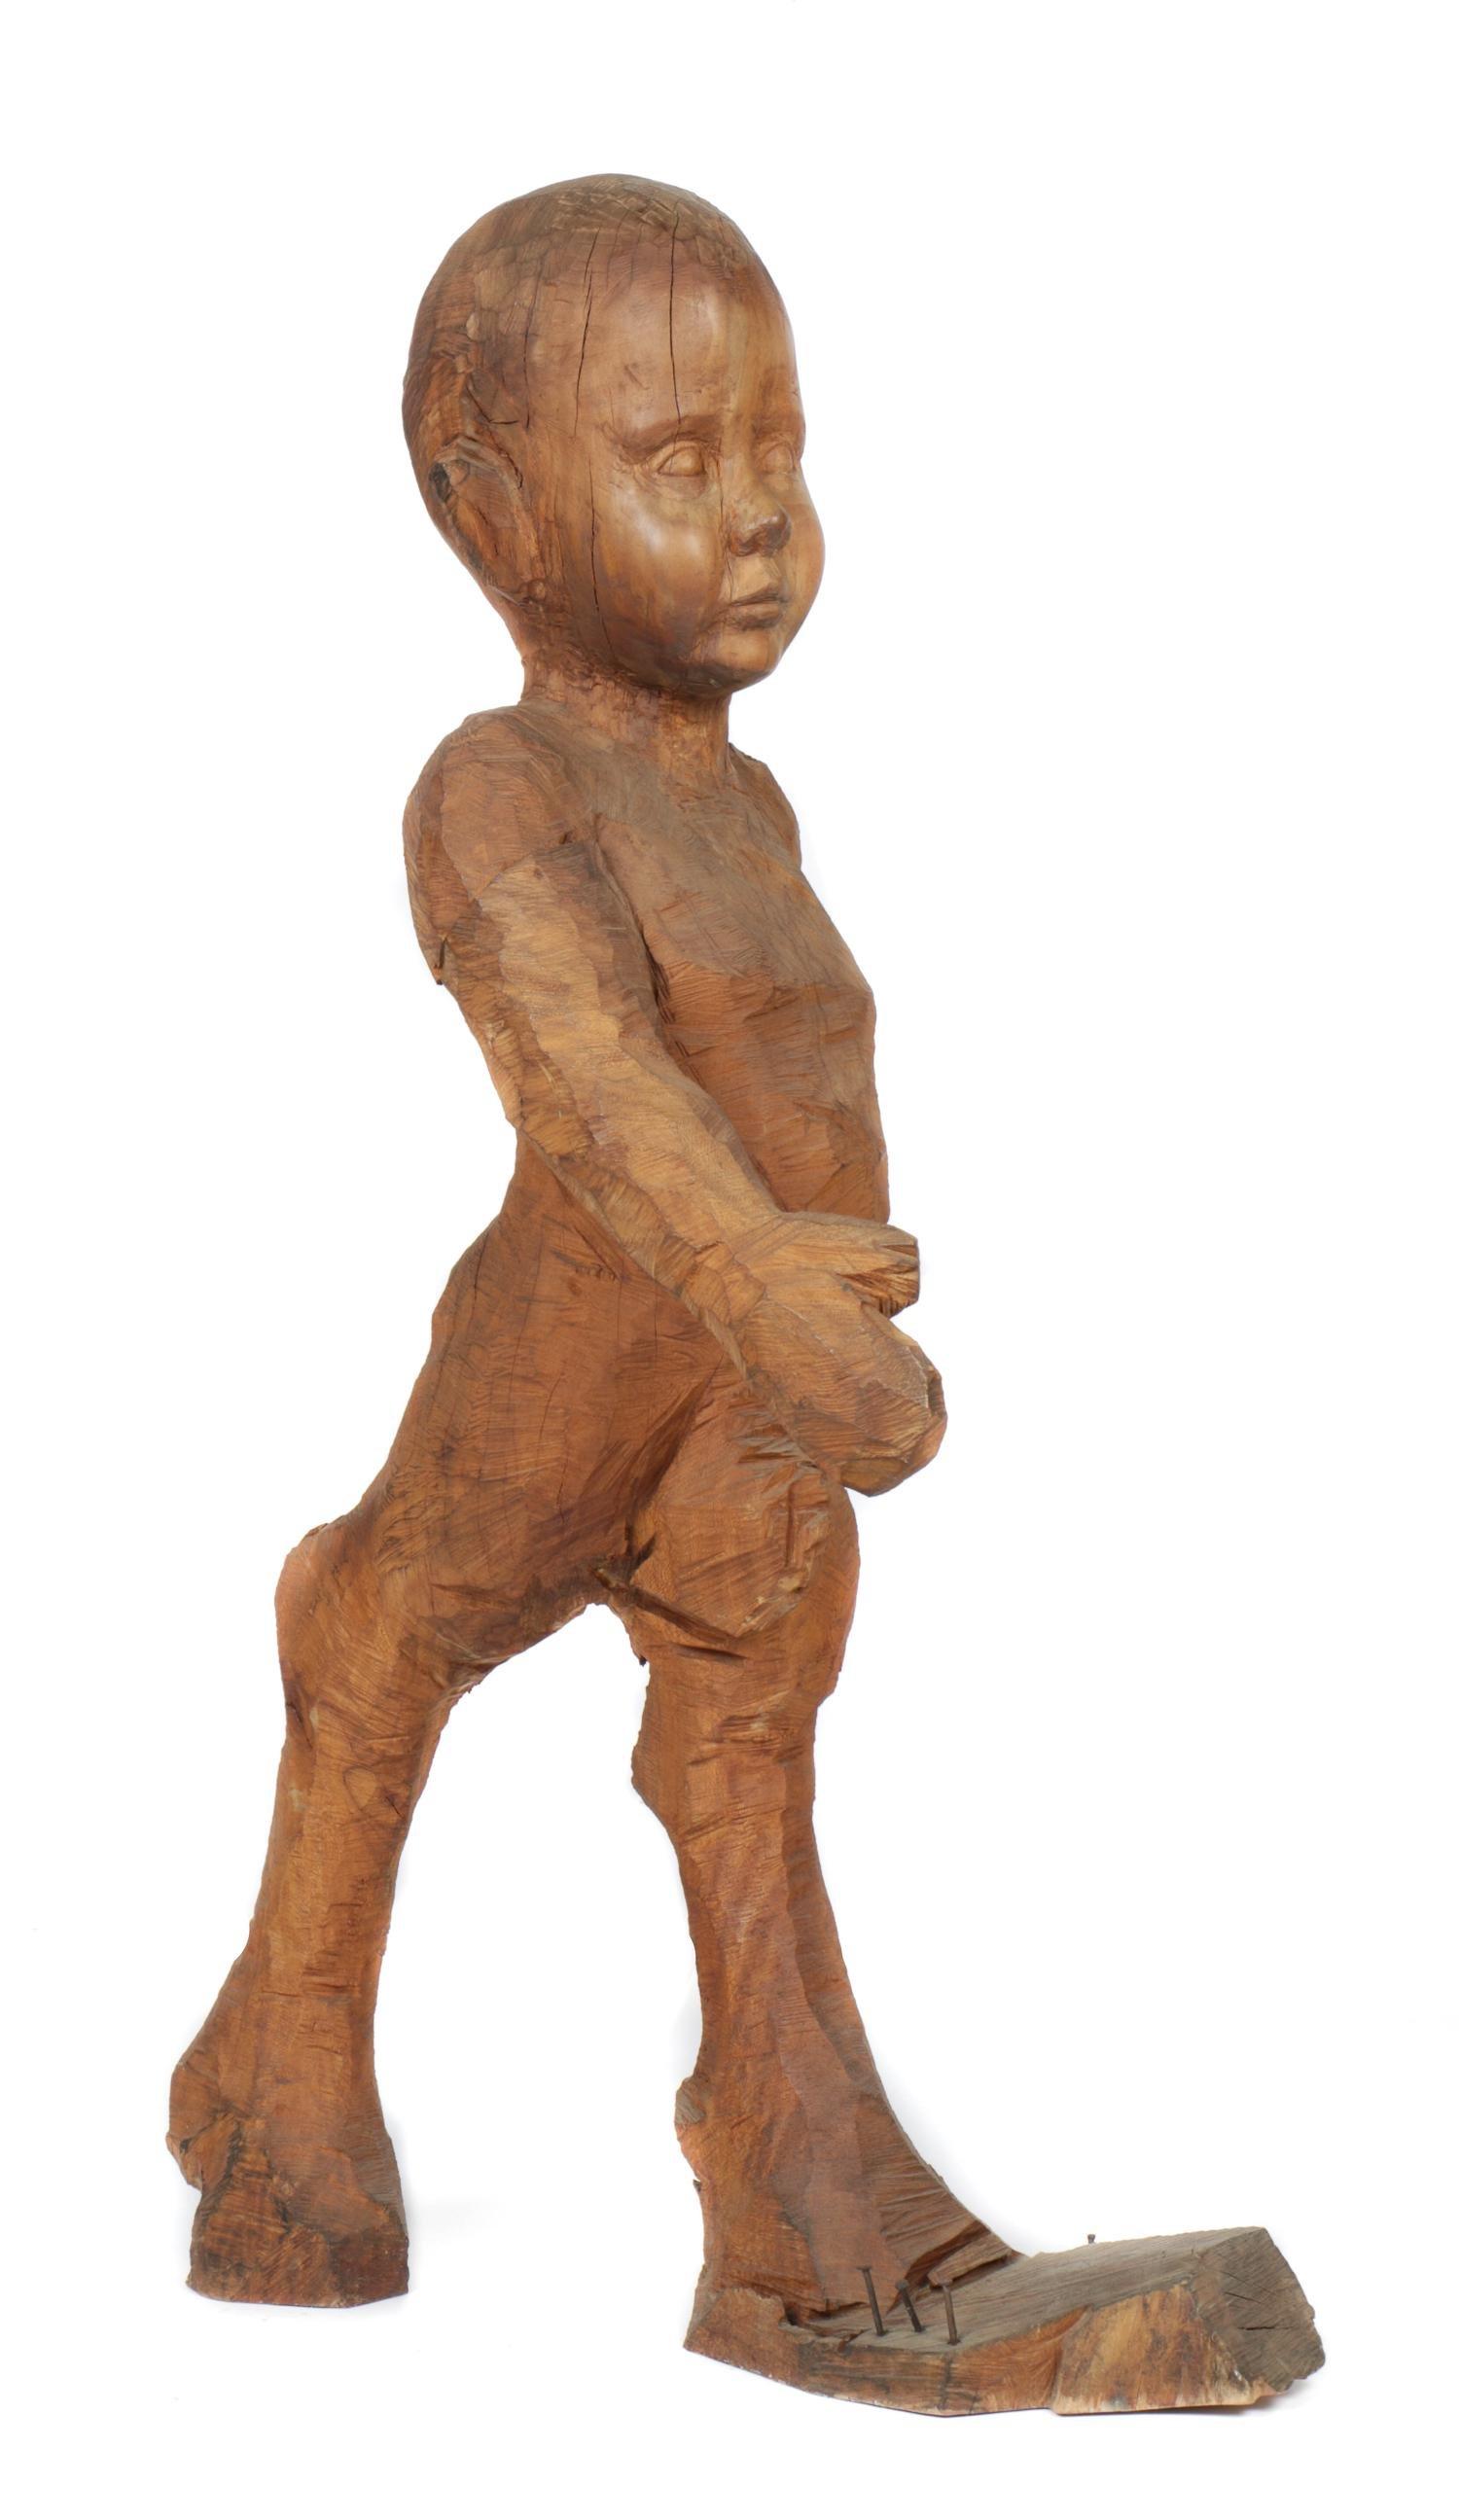 Daniel Wurtzel (American, b.1962) Wood Sculpture